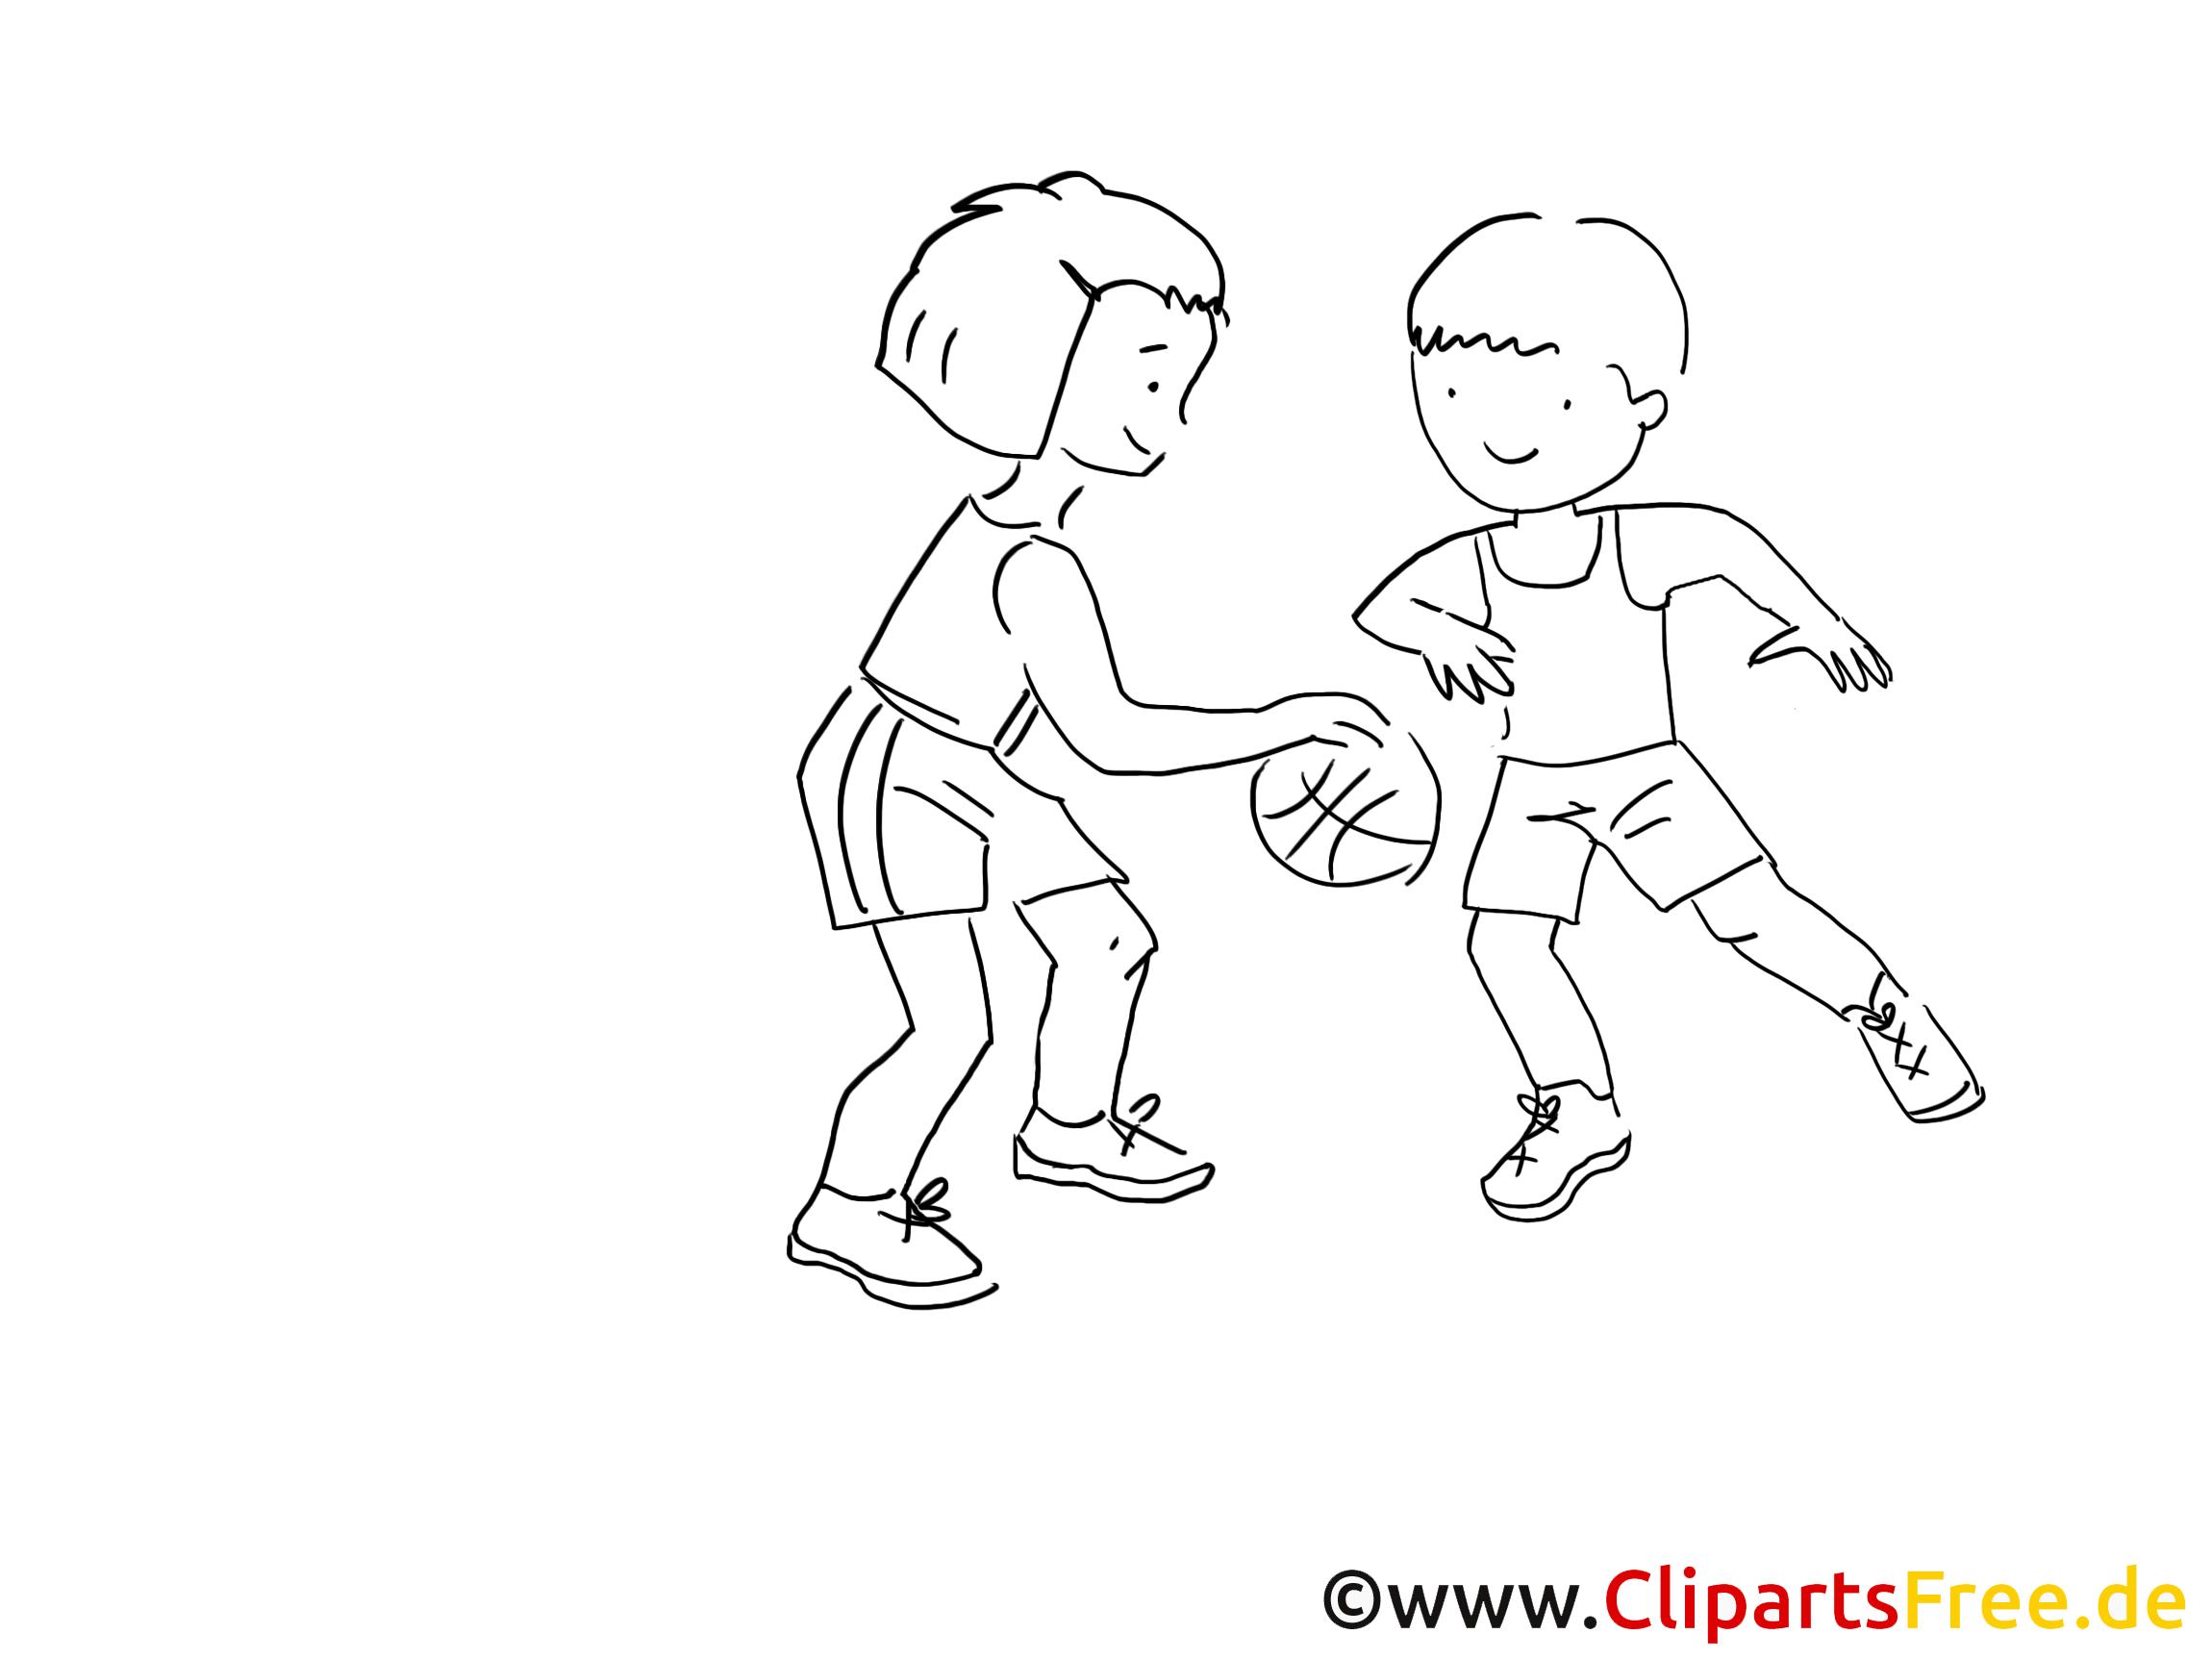 enfants football dessins gratuits sport colorier sport coloriages dessin picture image. Black Bedroom Furniture Sets. Home Design Ideas